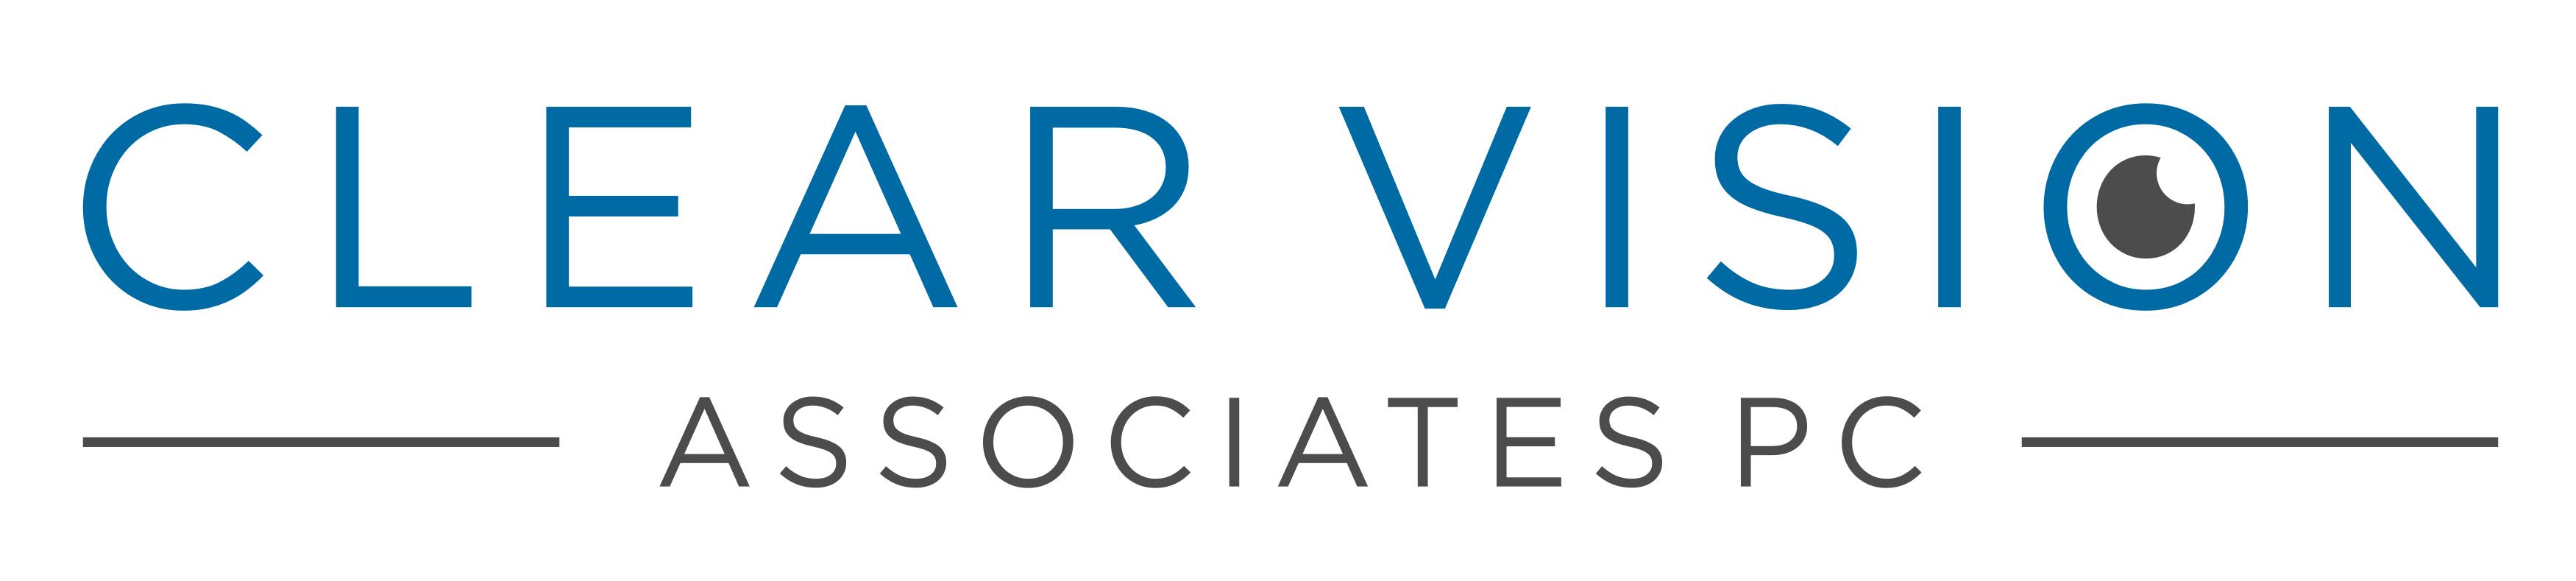 Clear Vision Associates